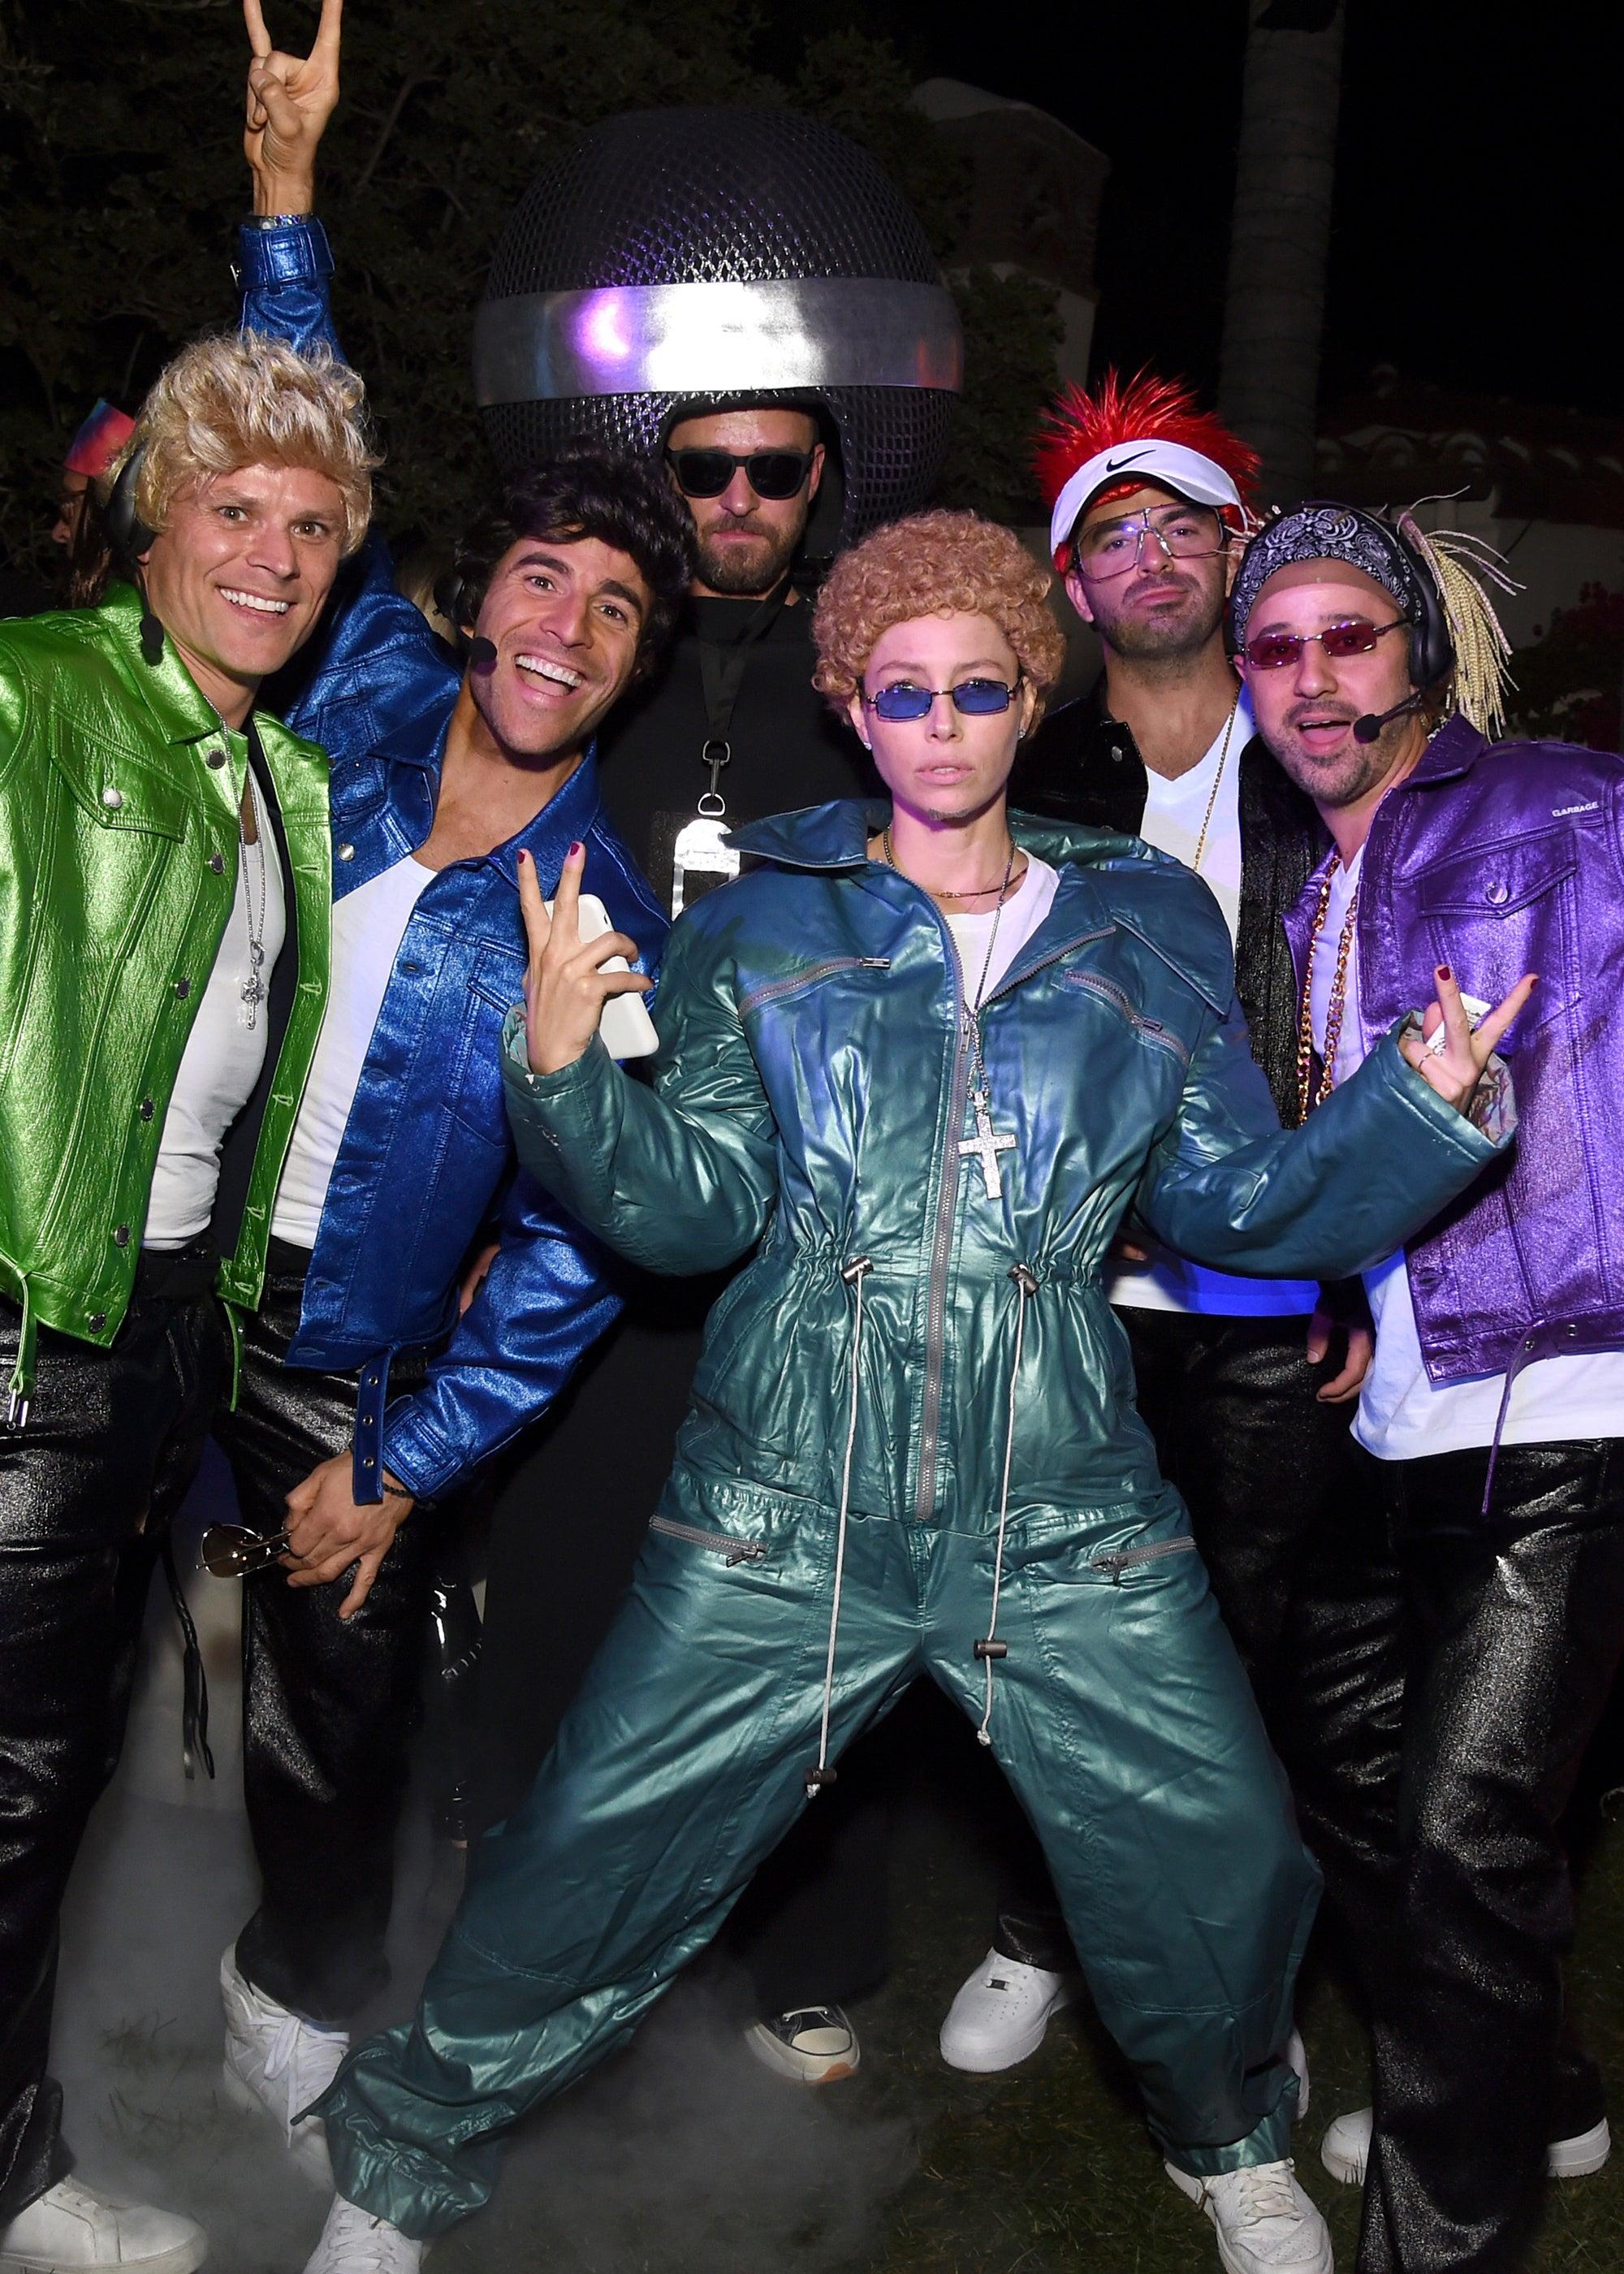 Best Celebrity Halloween Costumes 2019 What Stars Wore